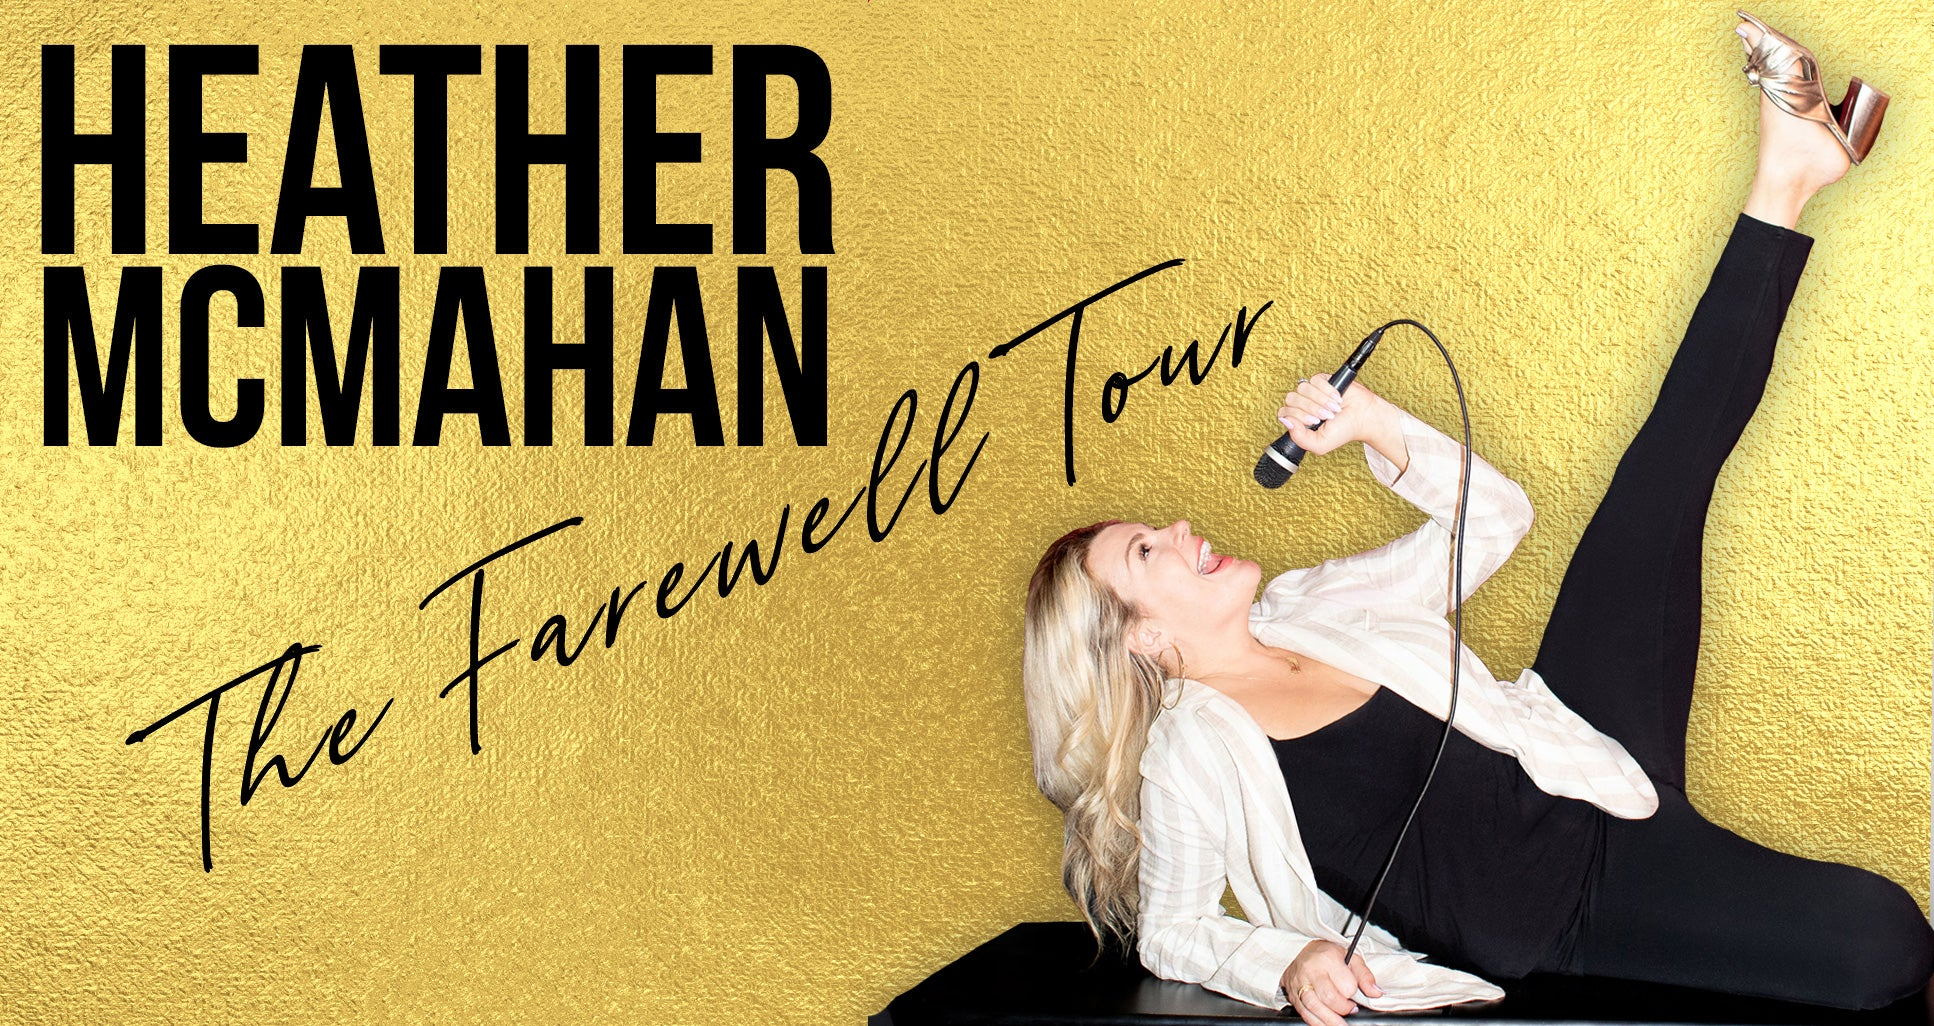 RESCHEDULED: Heather McMahan: The Farewell Tour